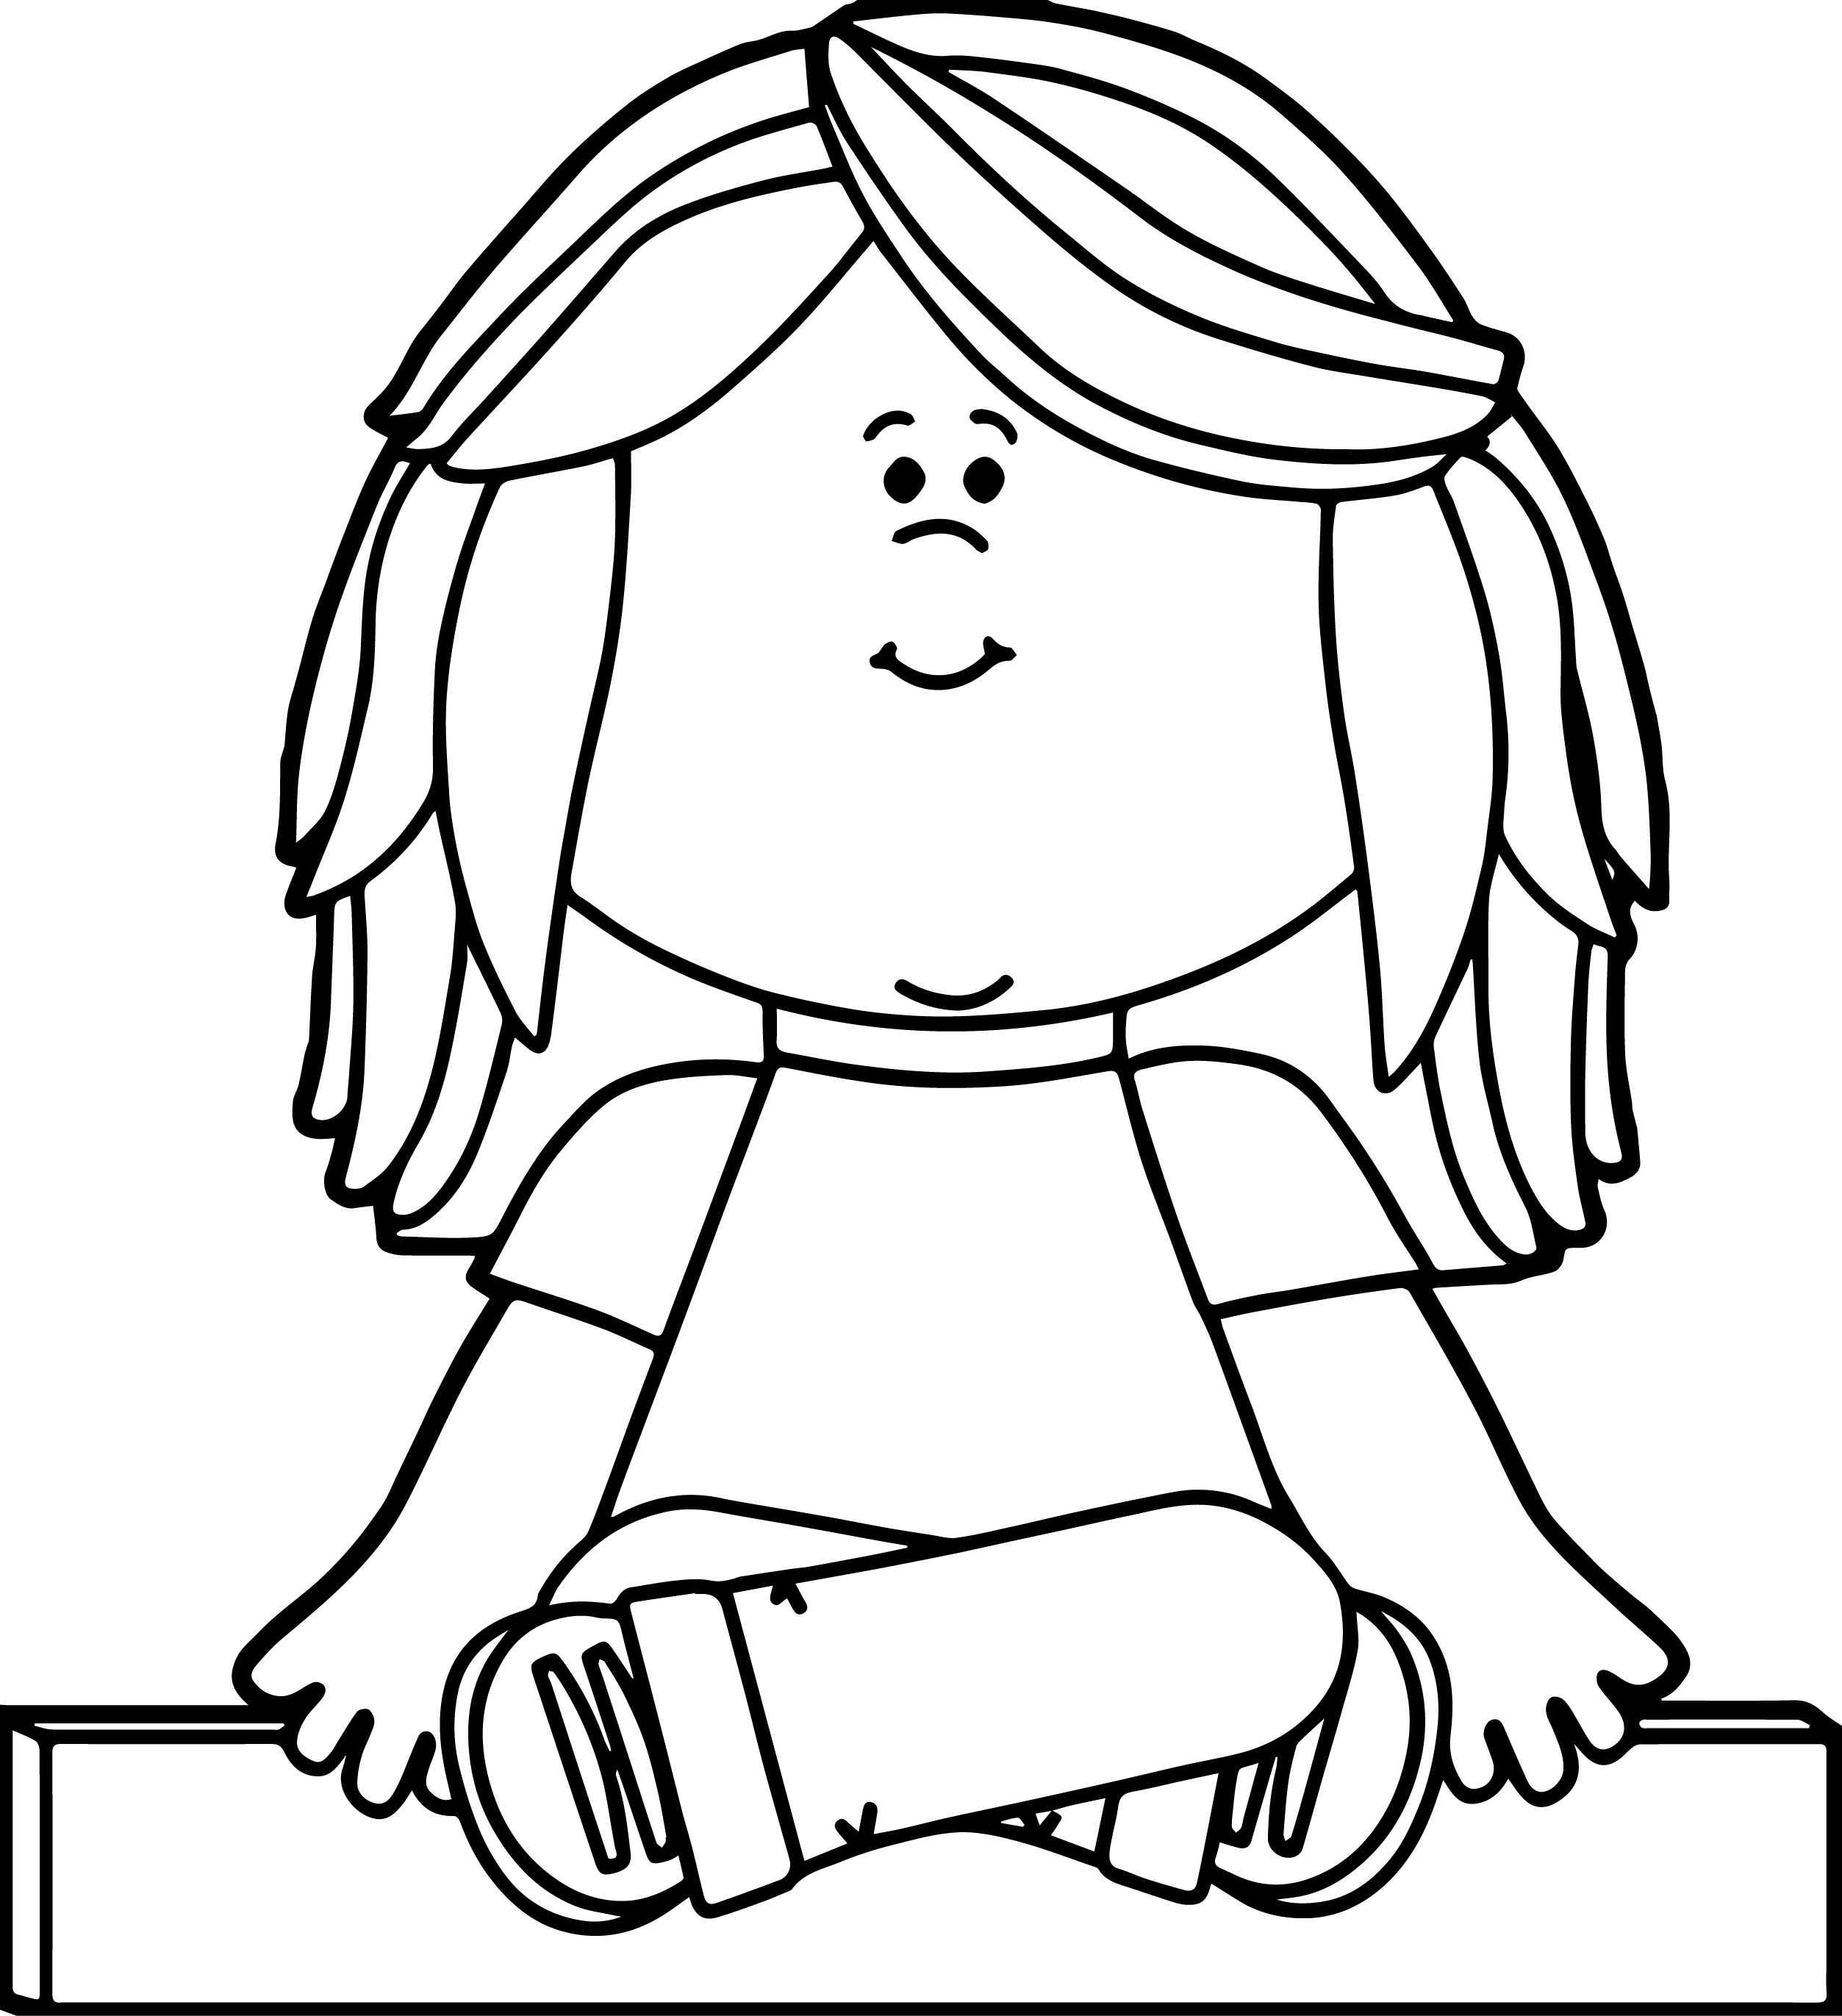 Kid Sitting On Math Minus Symbol Kids Coloring Page